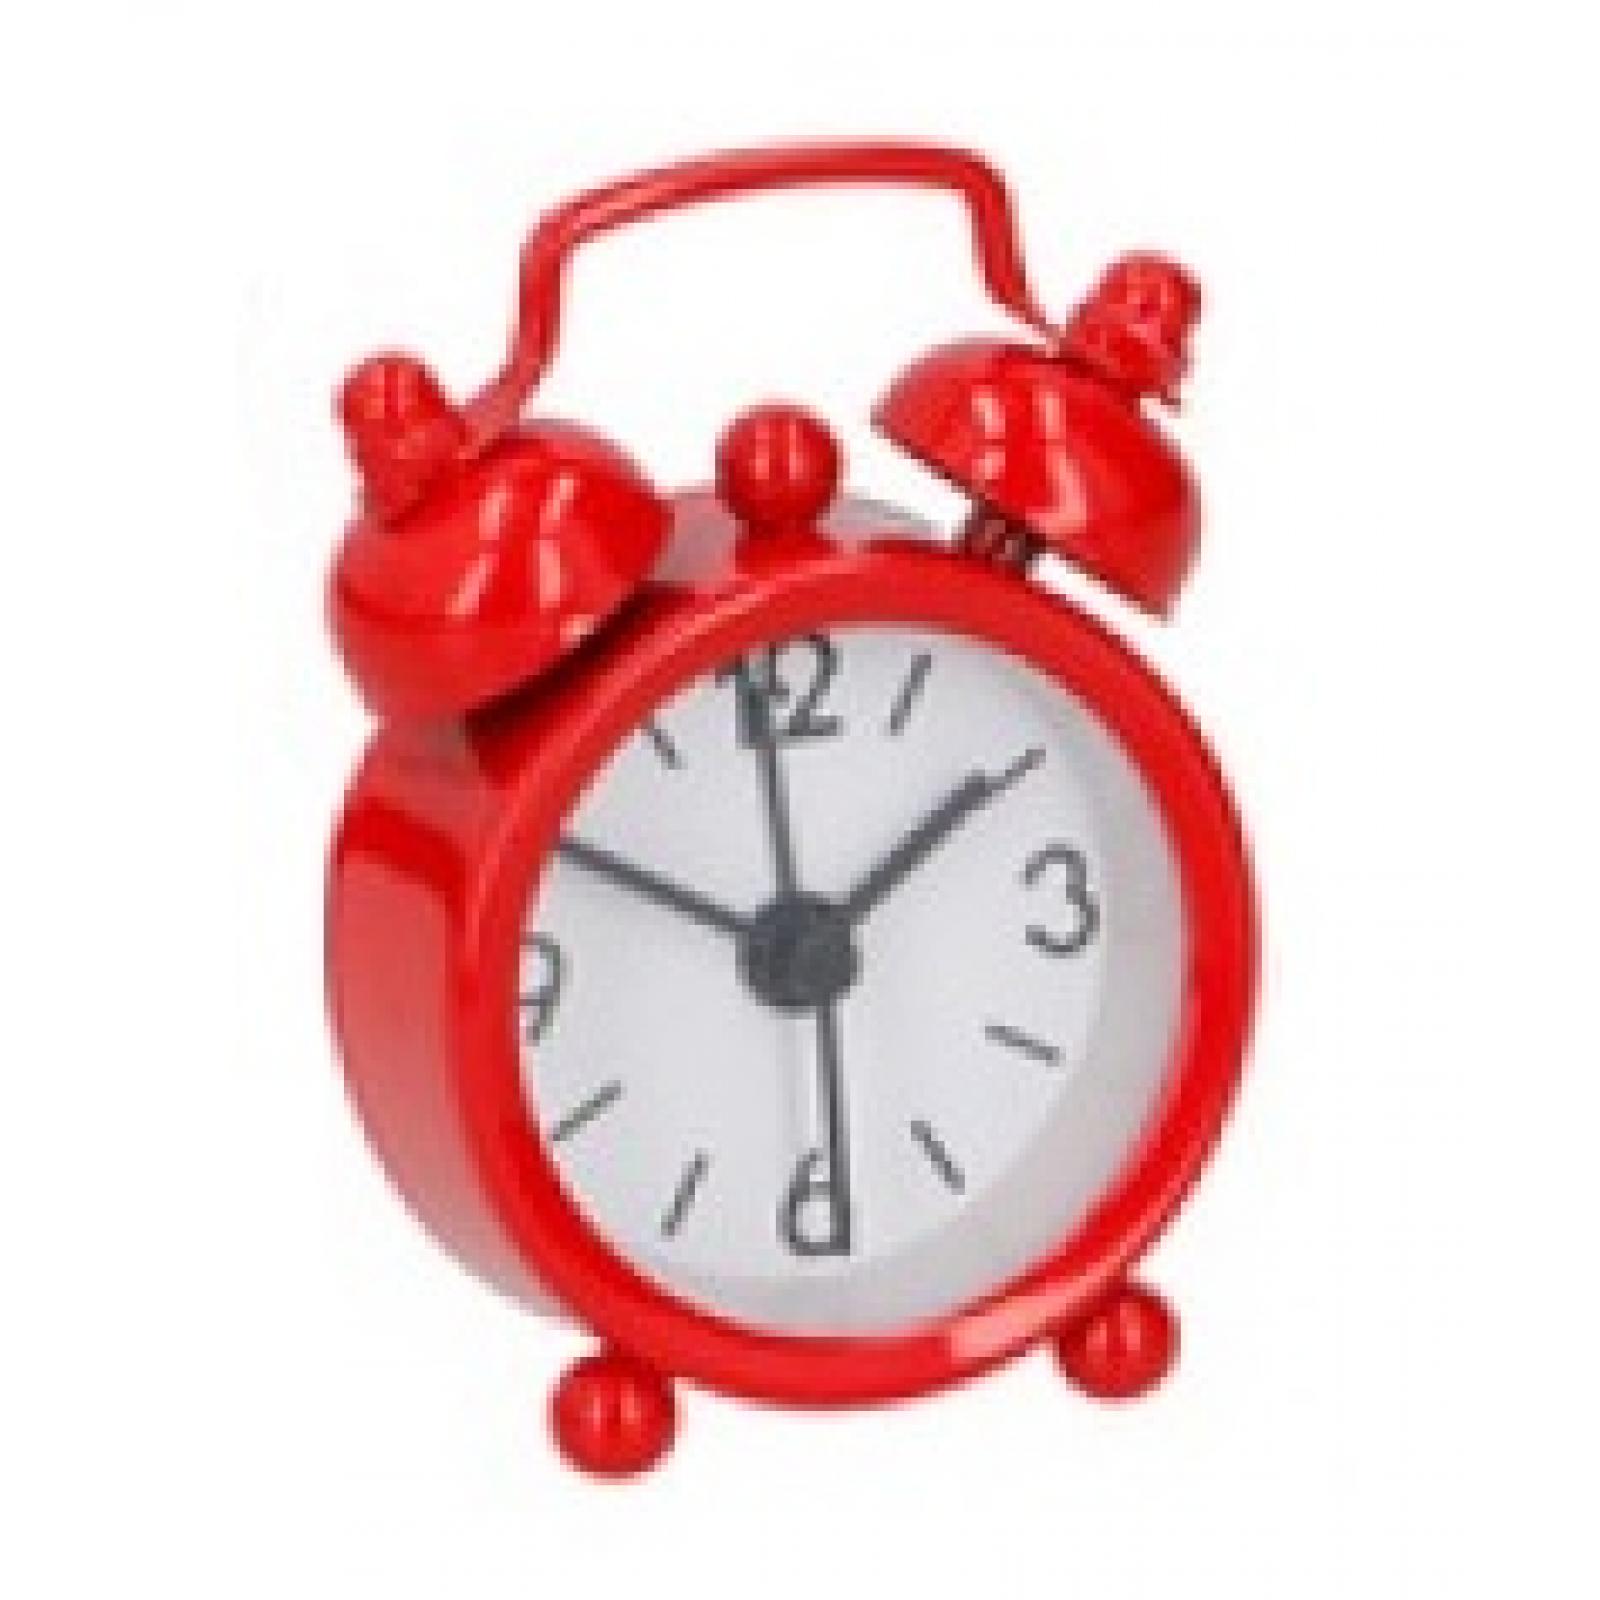 Mini Despertador De Viaje Reloj En 5 Colores Rojo Rosa Azul Negro